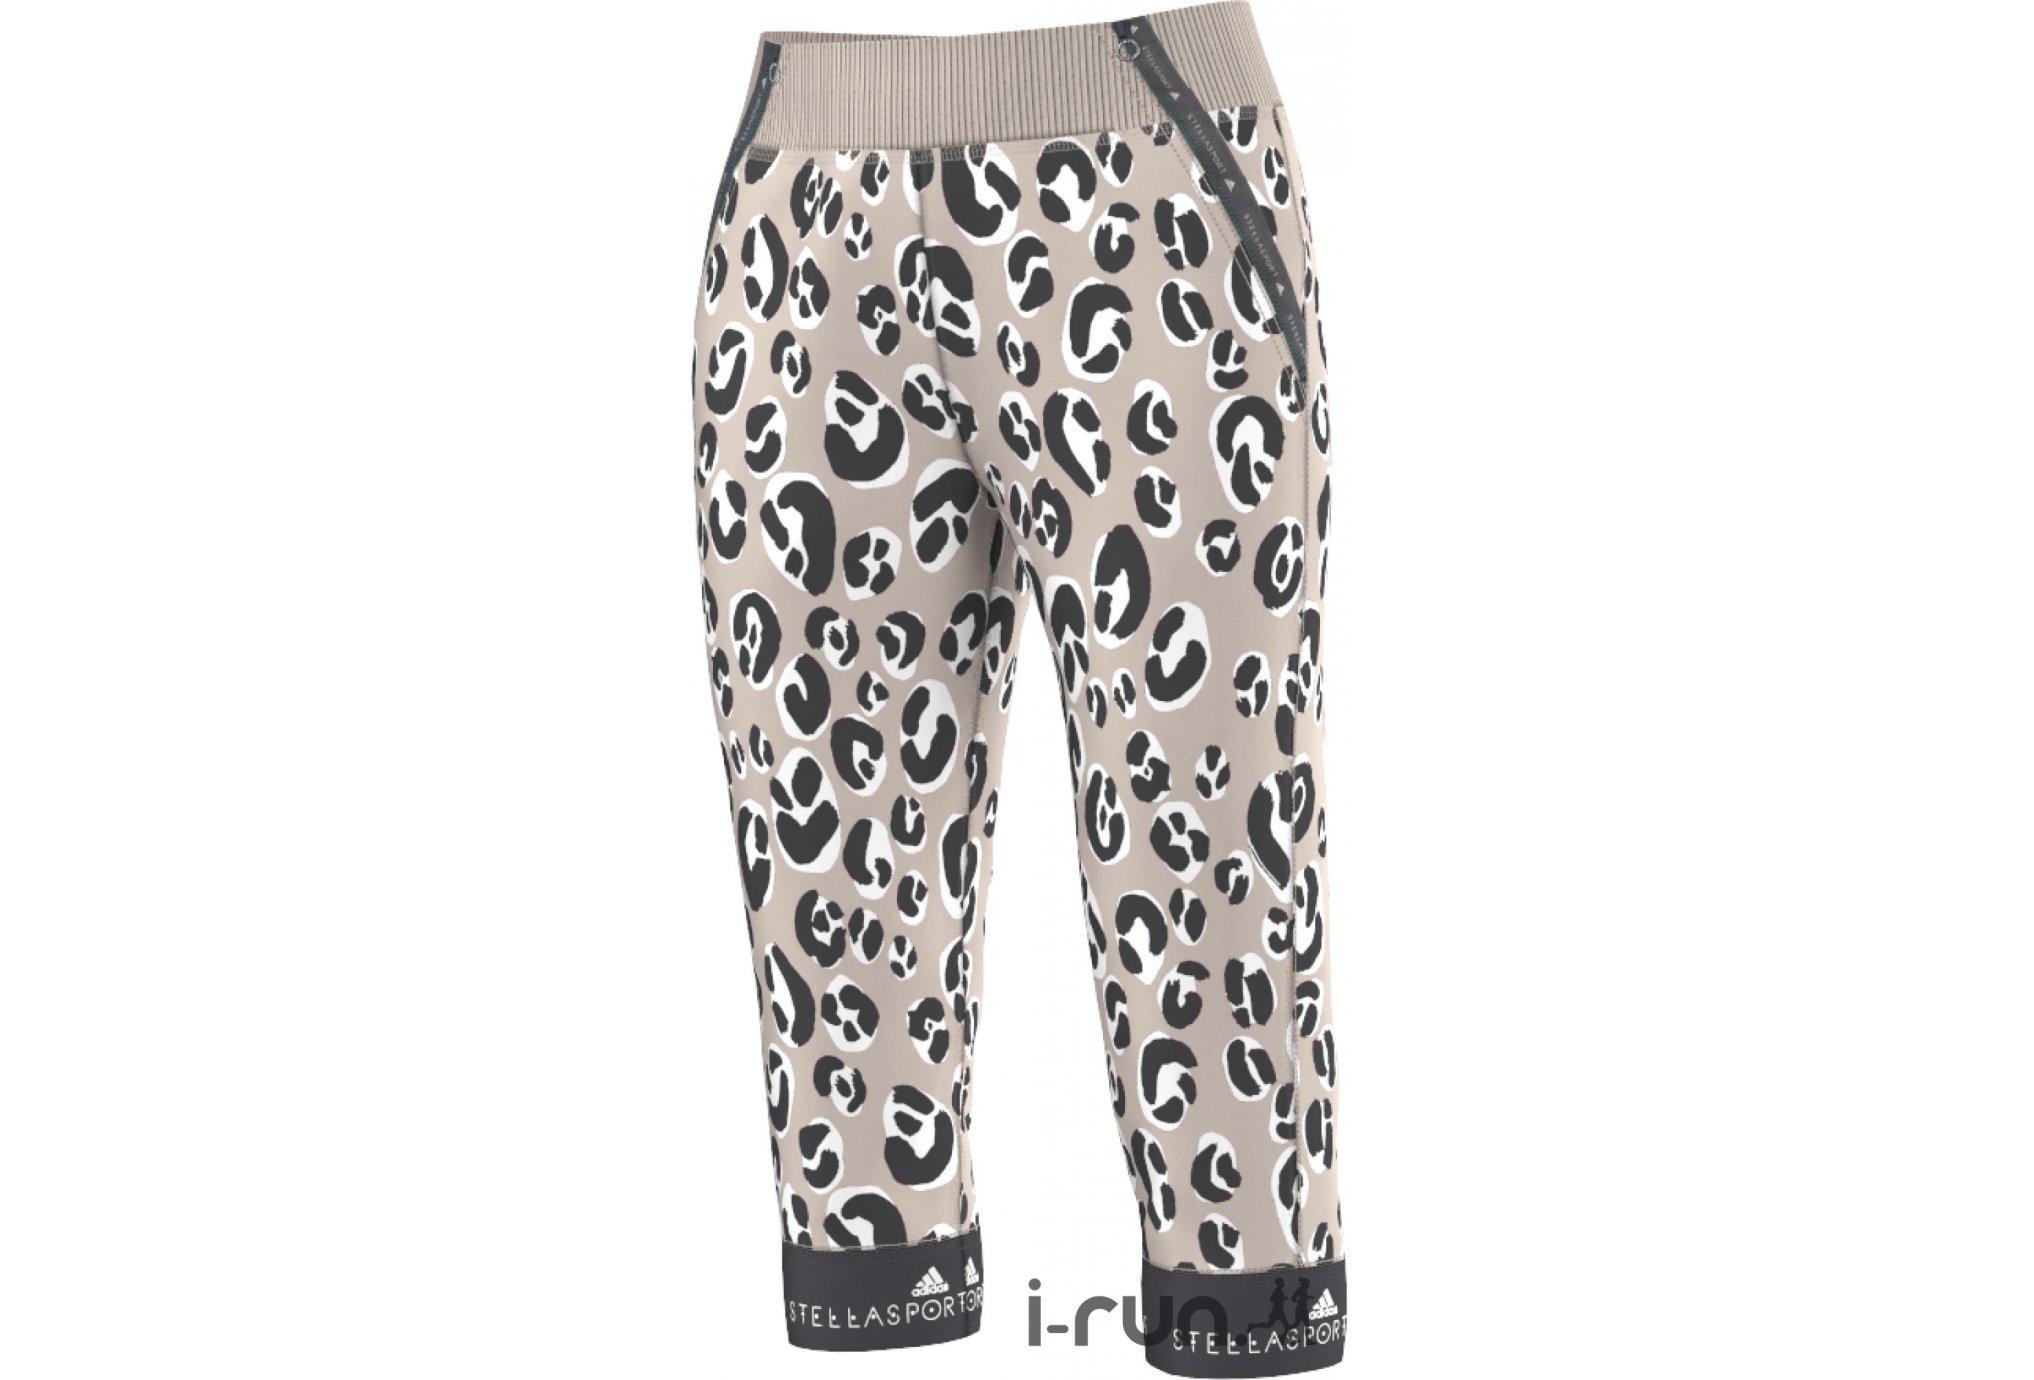 Adidas pantalon 3 4 stellasport w pas cher destockage adidas running pantal - Destockage fitness avis ...